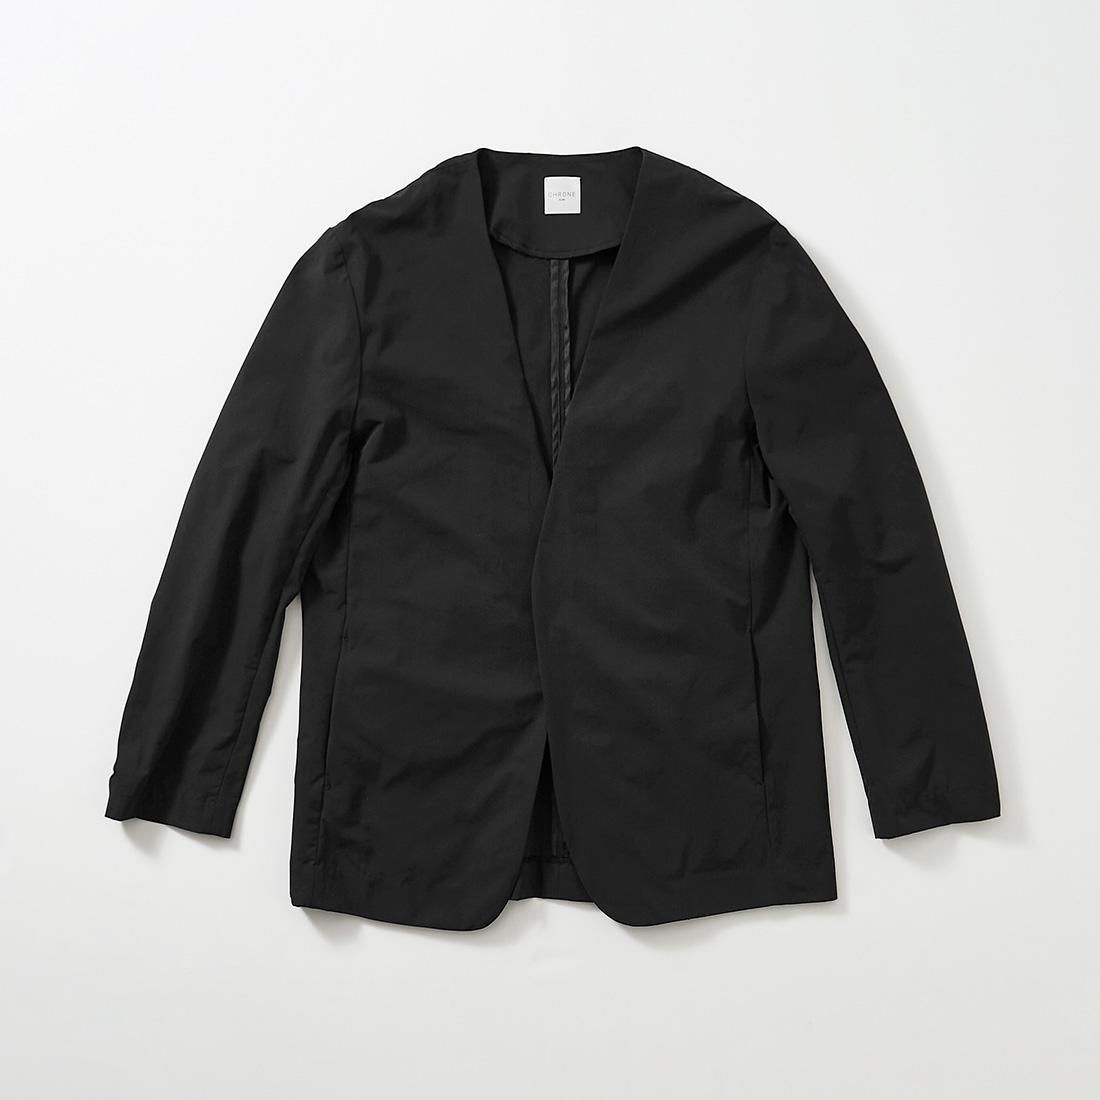 borderless no-collar jacket -male-の商品写真0